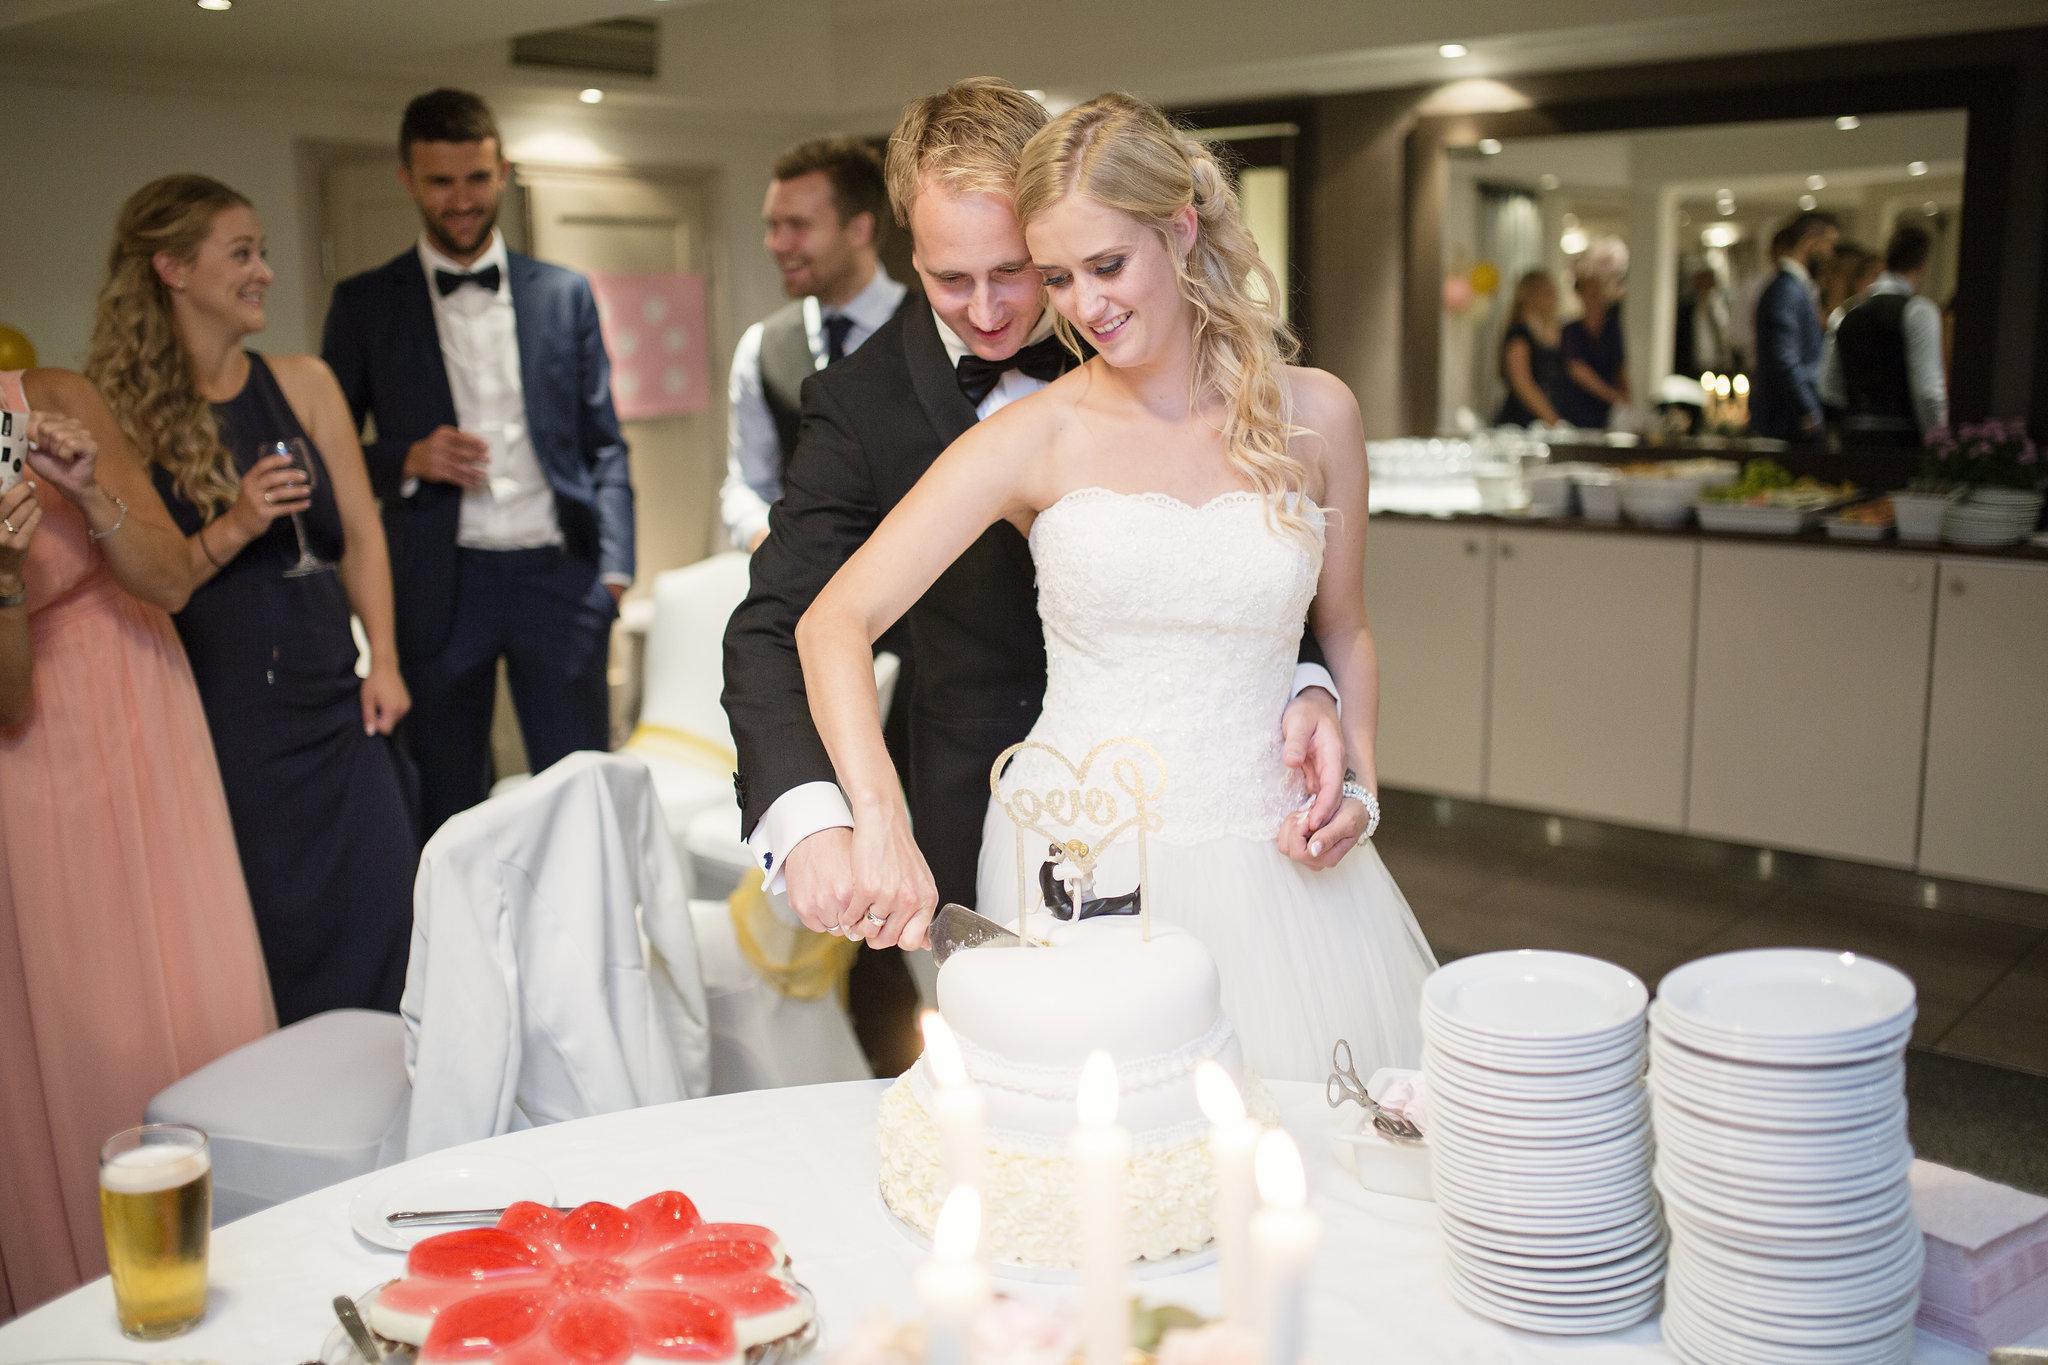 AL_1308_1714-STfotograf-bryllup-tyrifjorden.jpg